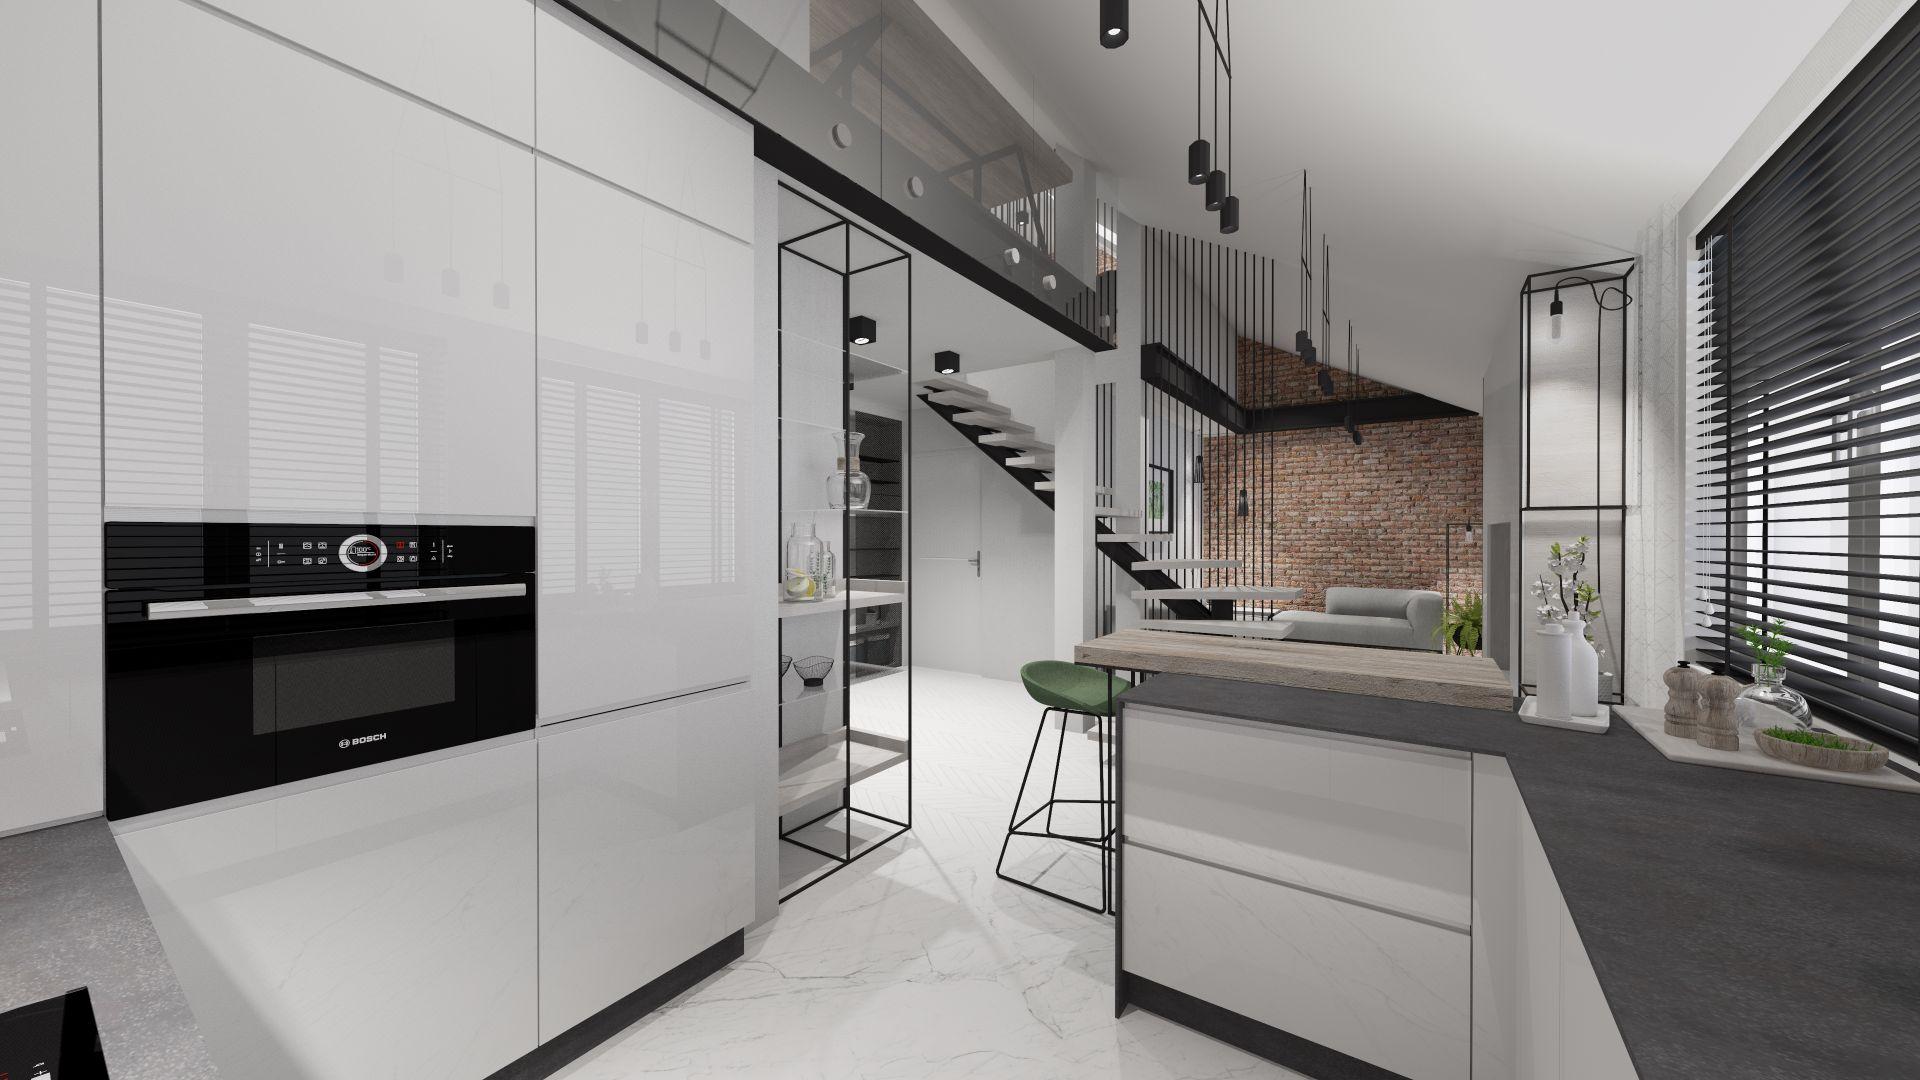 antresola_singiel_projektantpulawy-pulawy-interior-design-designer-industrial-steel-roof-antresola-brick 7